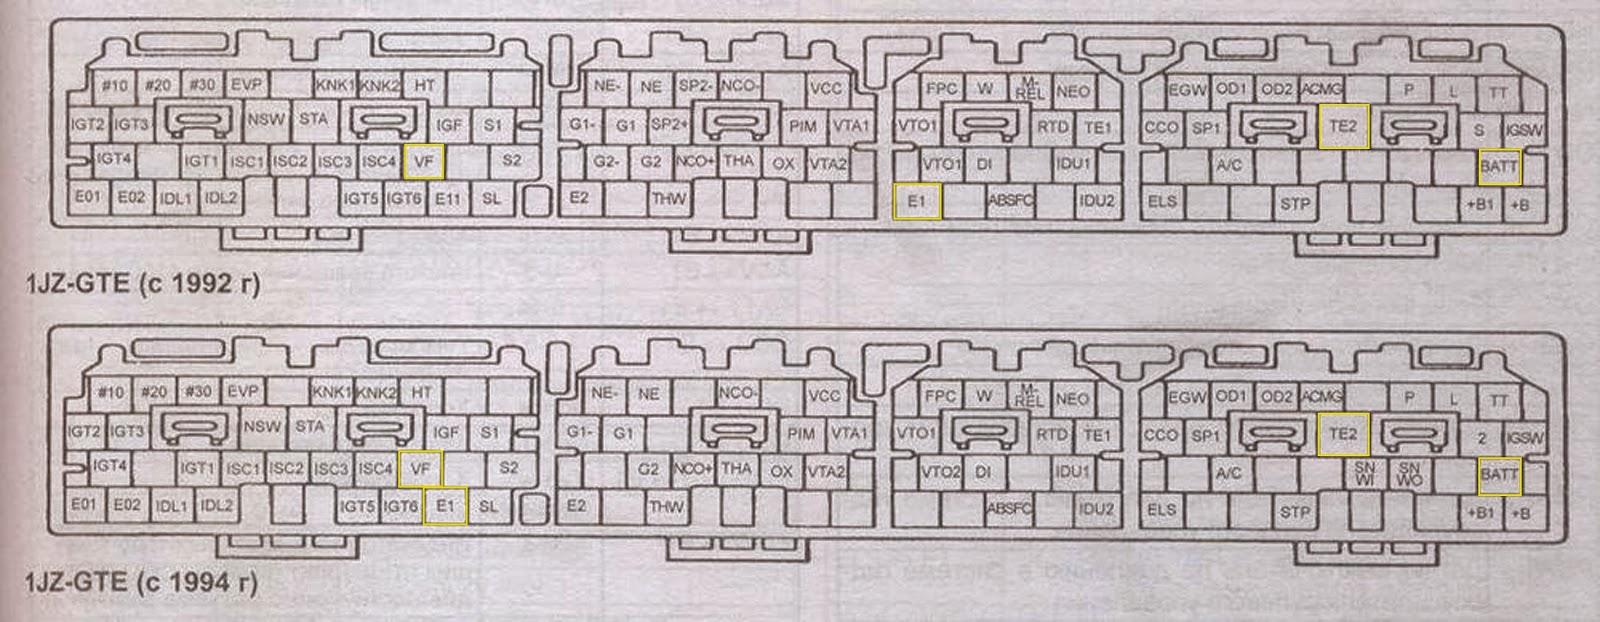 2jz Gte Vvt I Ecu Pinout Wiring Diagram | Wiring Library